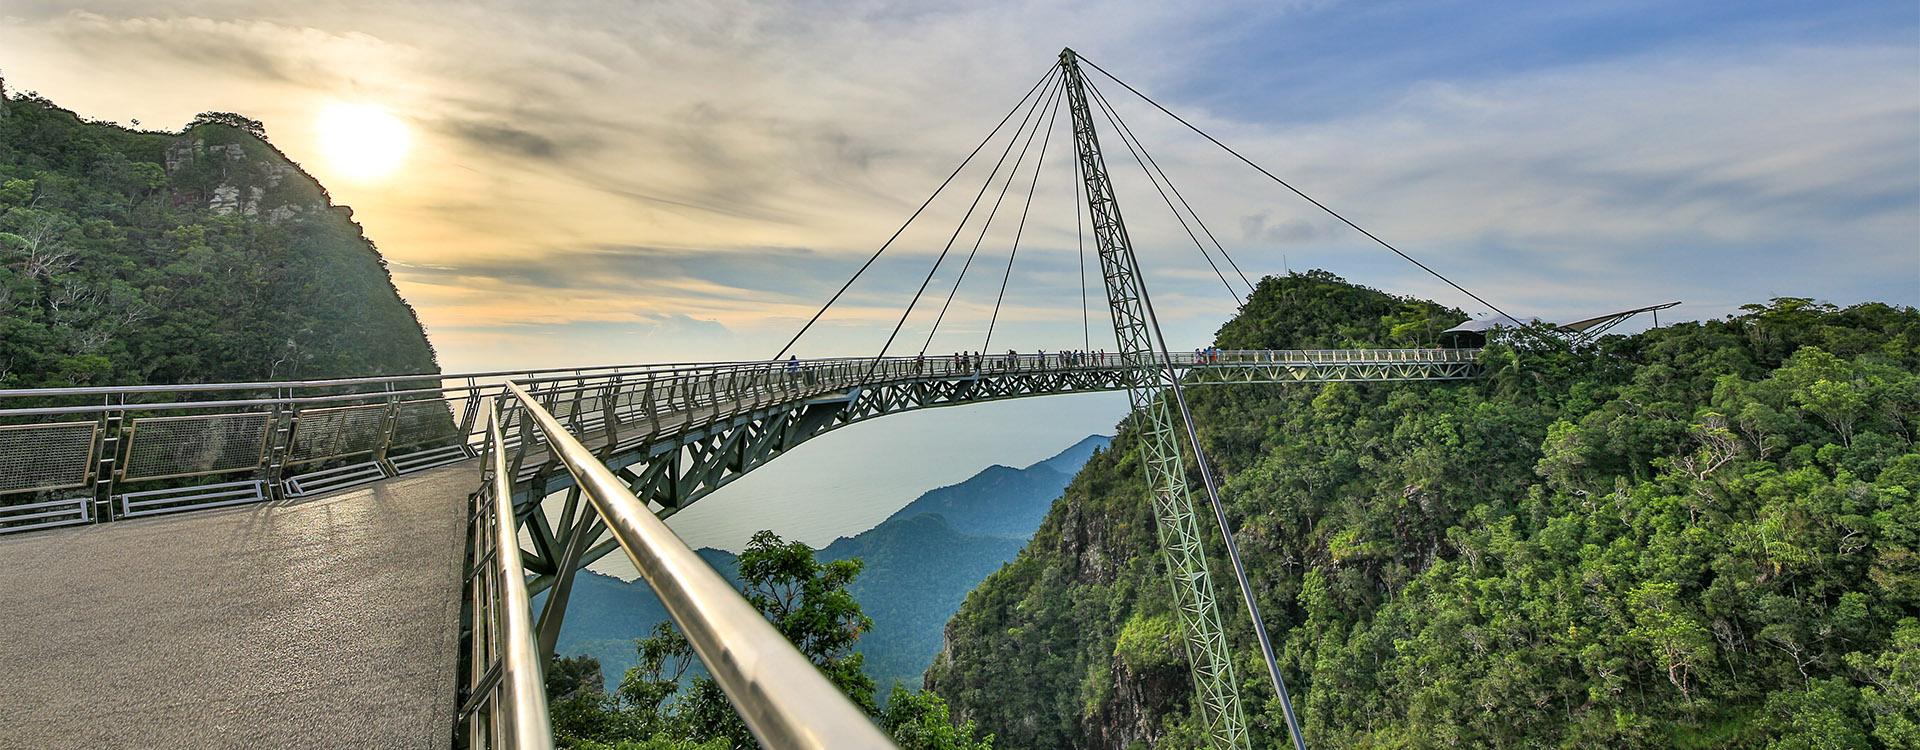 Skybridge over rainforest Langkawi Malaysia